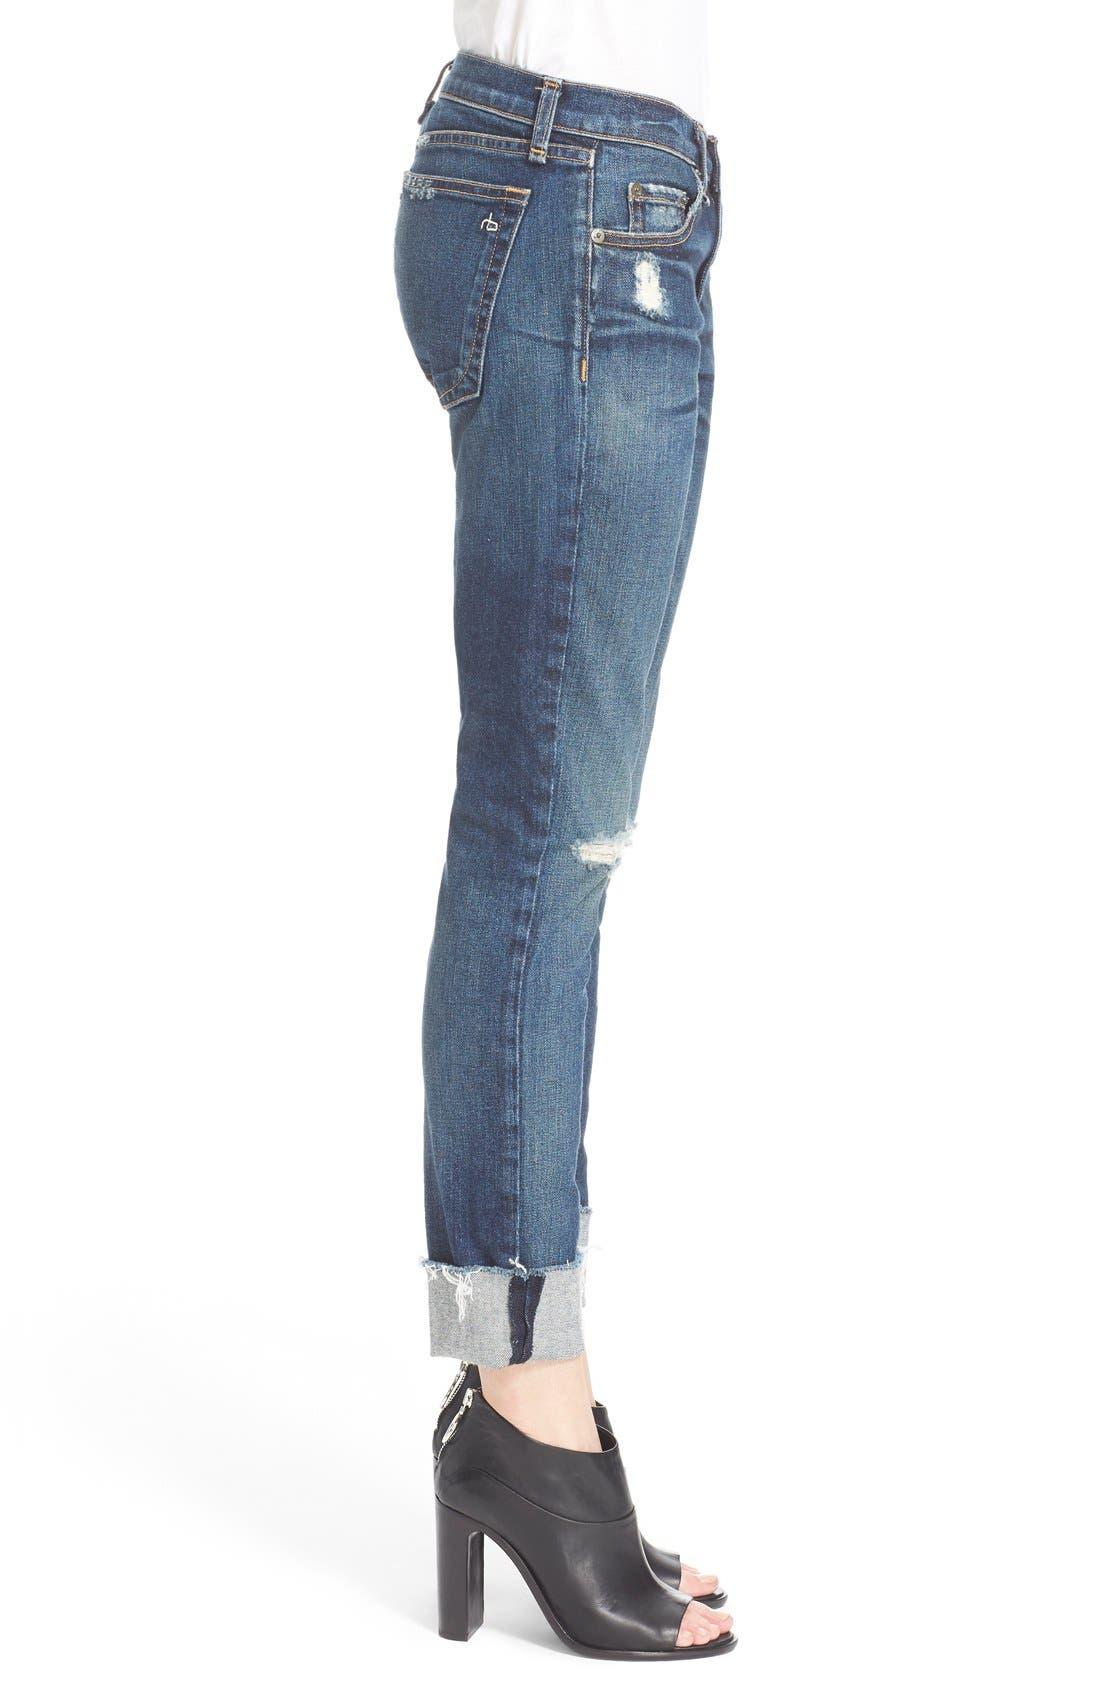 Alternate Image 2  - rag & bone/JEAN 'The Dre' Slim Fit Boyfriend Jeans (Mabel)